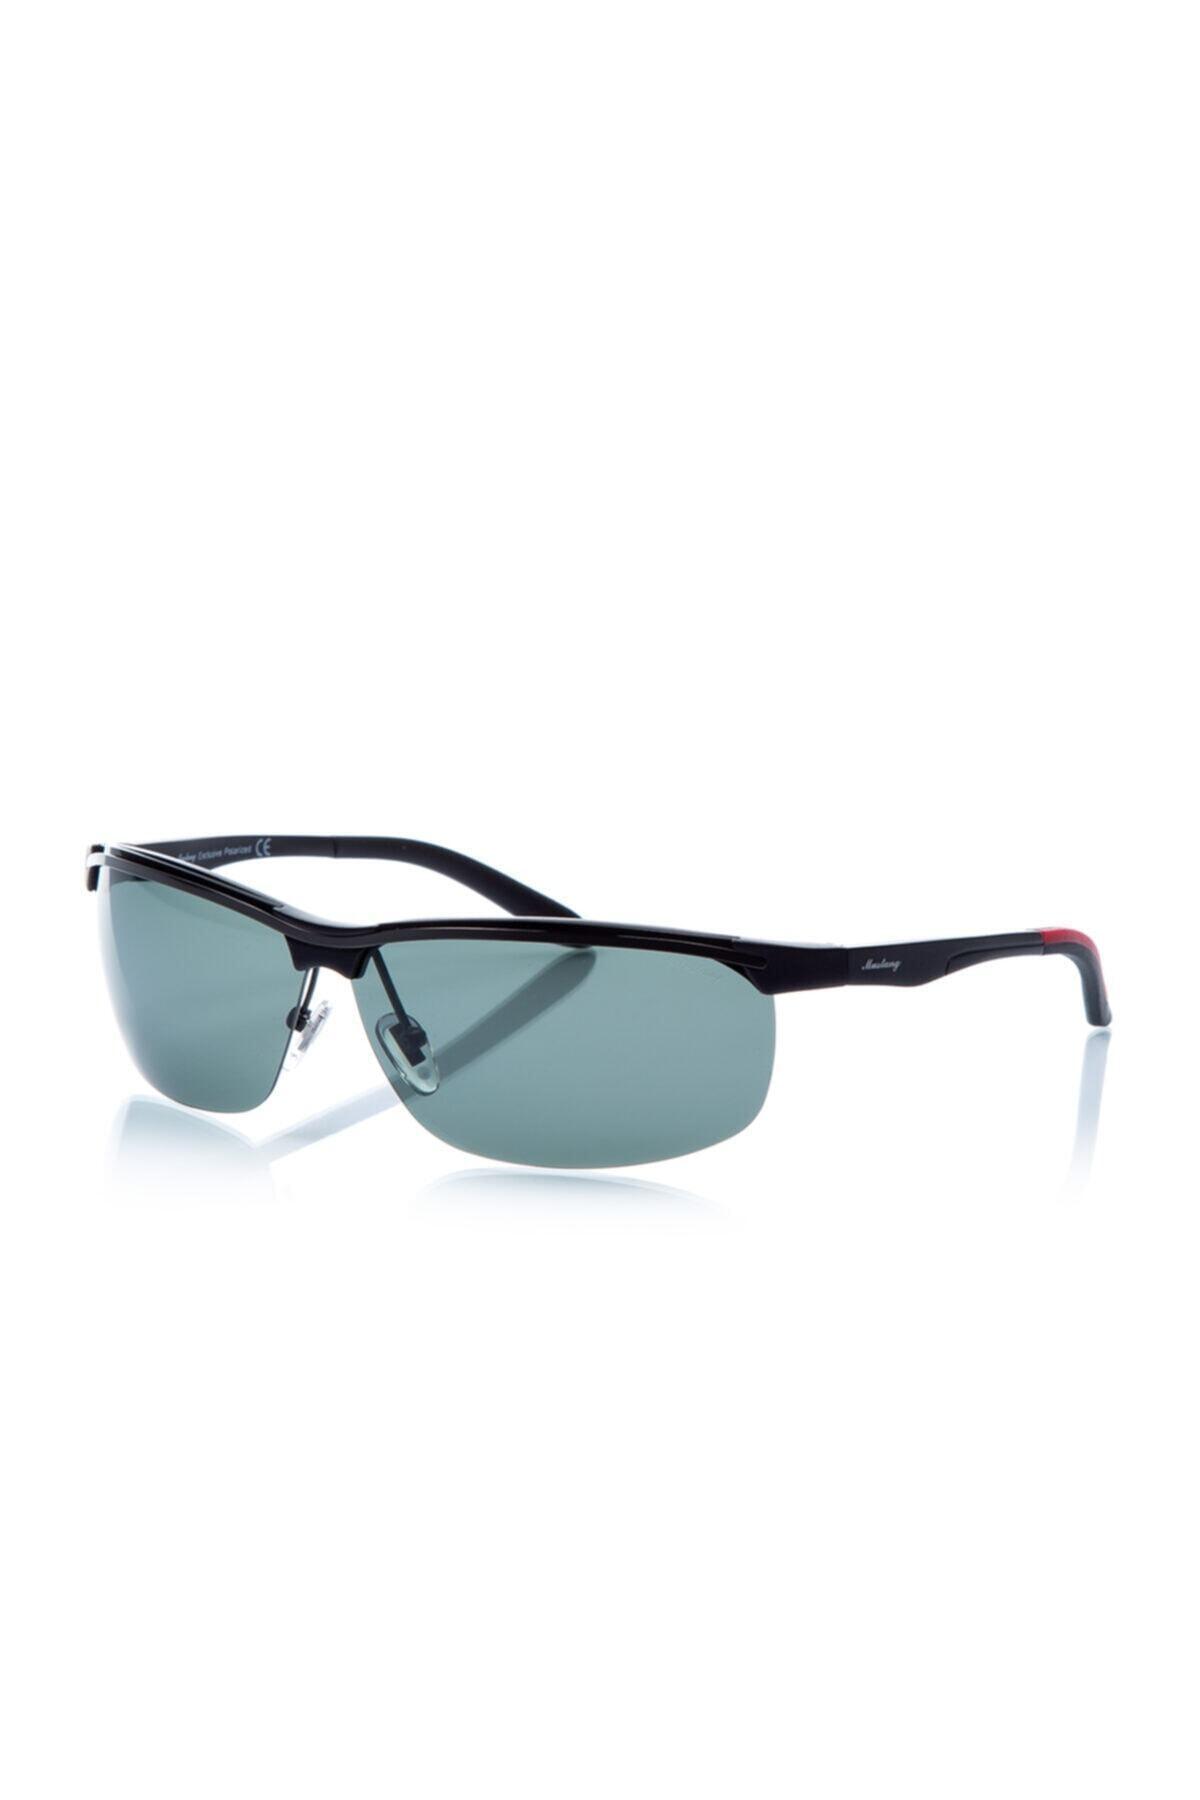 خرید عینک آفتابی خفن برند موستانگ رنگ آبی کد ty94555389